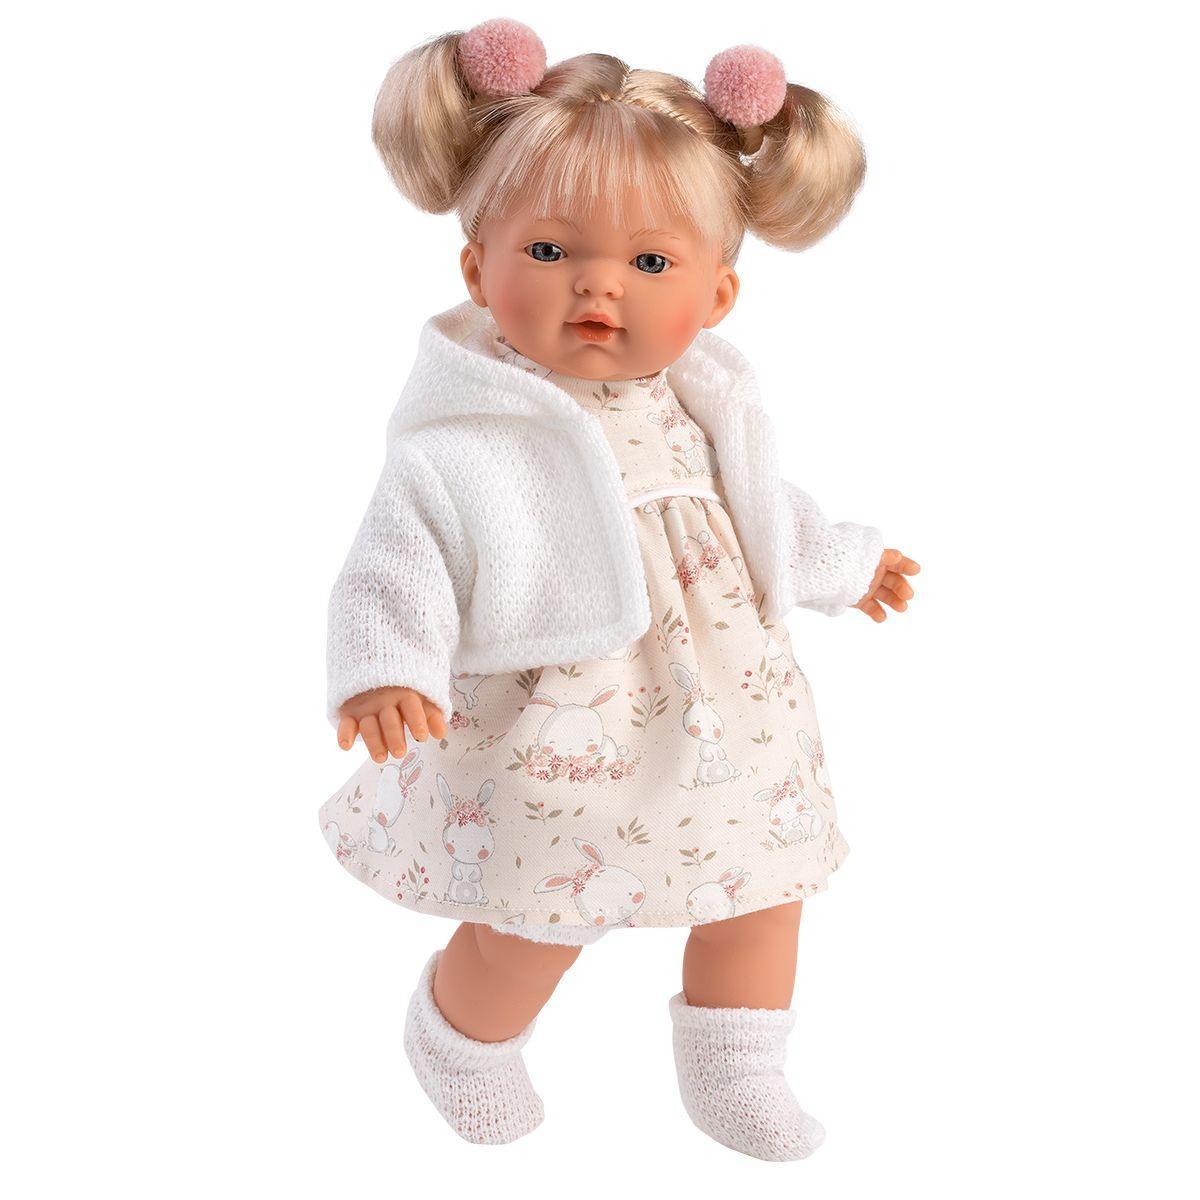 Кукла Llorens Роберта Лоренс Roberta 33 см 33116 интерактивная